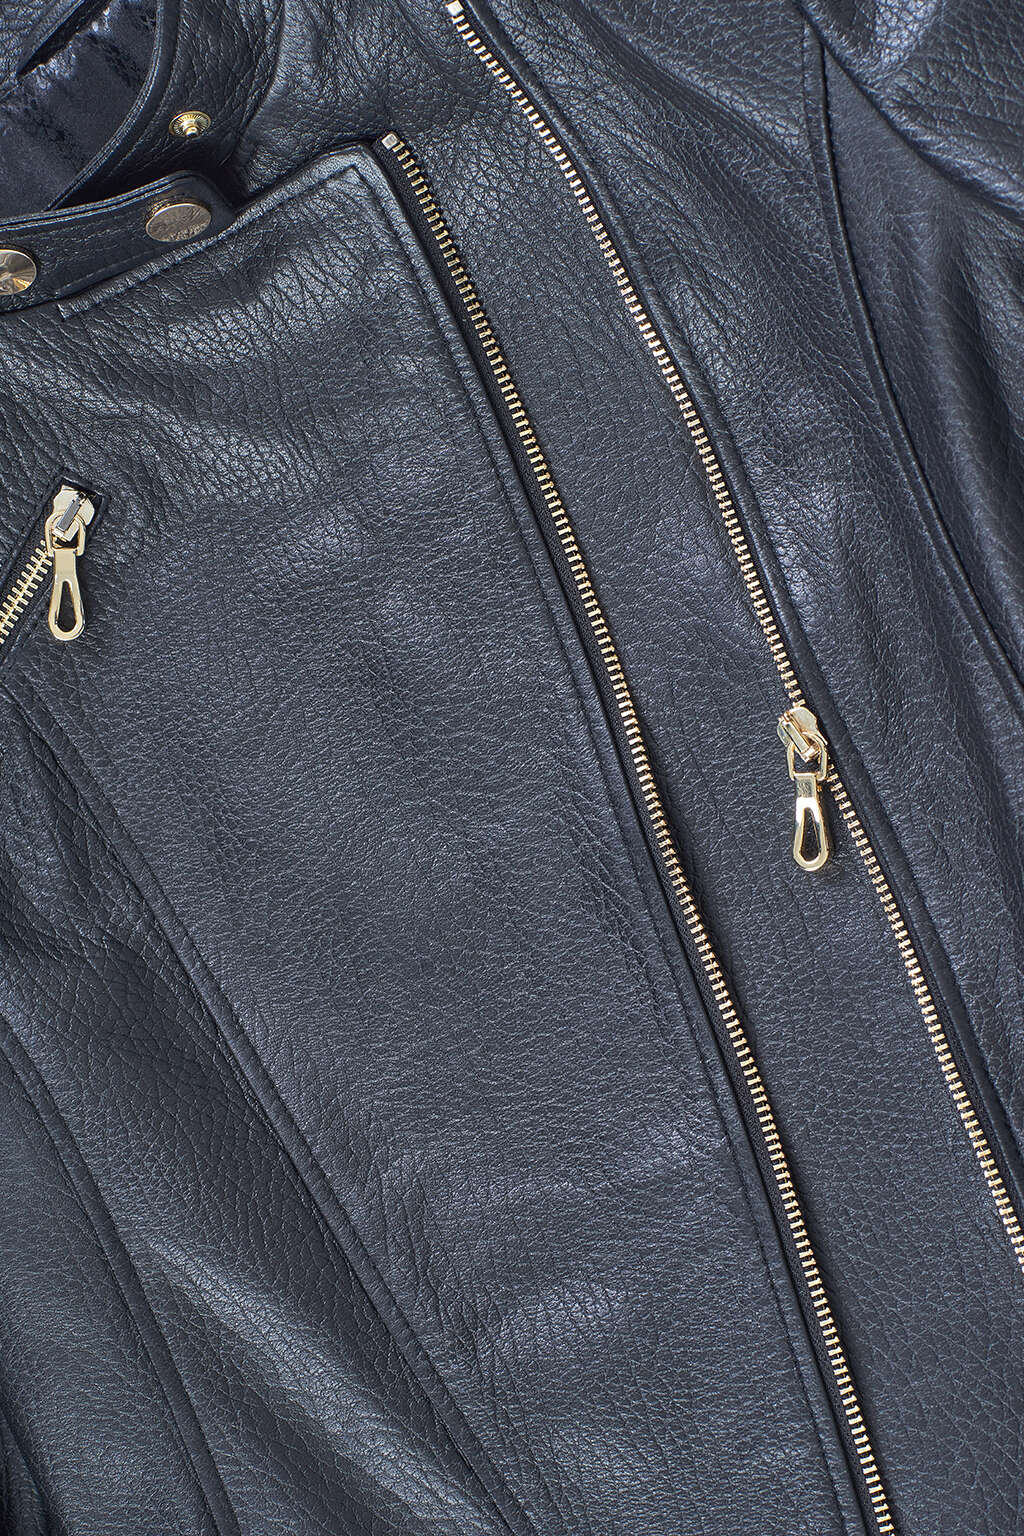 Zipper and Fabric Detail of Black Asymmetrical Biker Leather Jacket